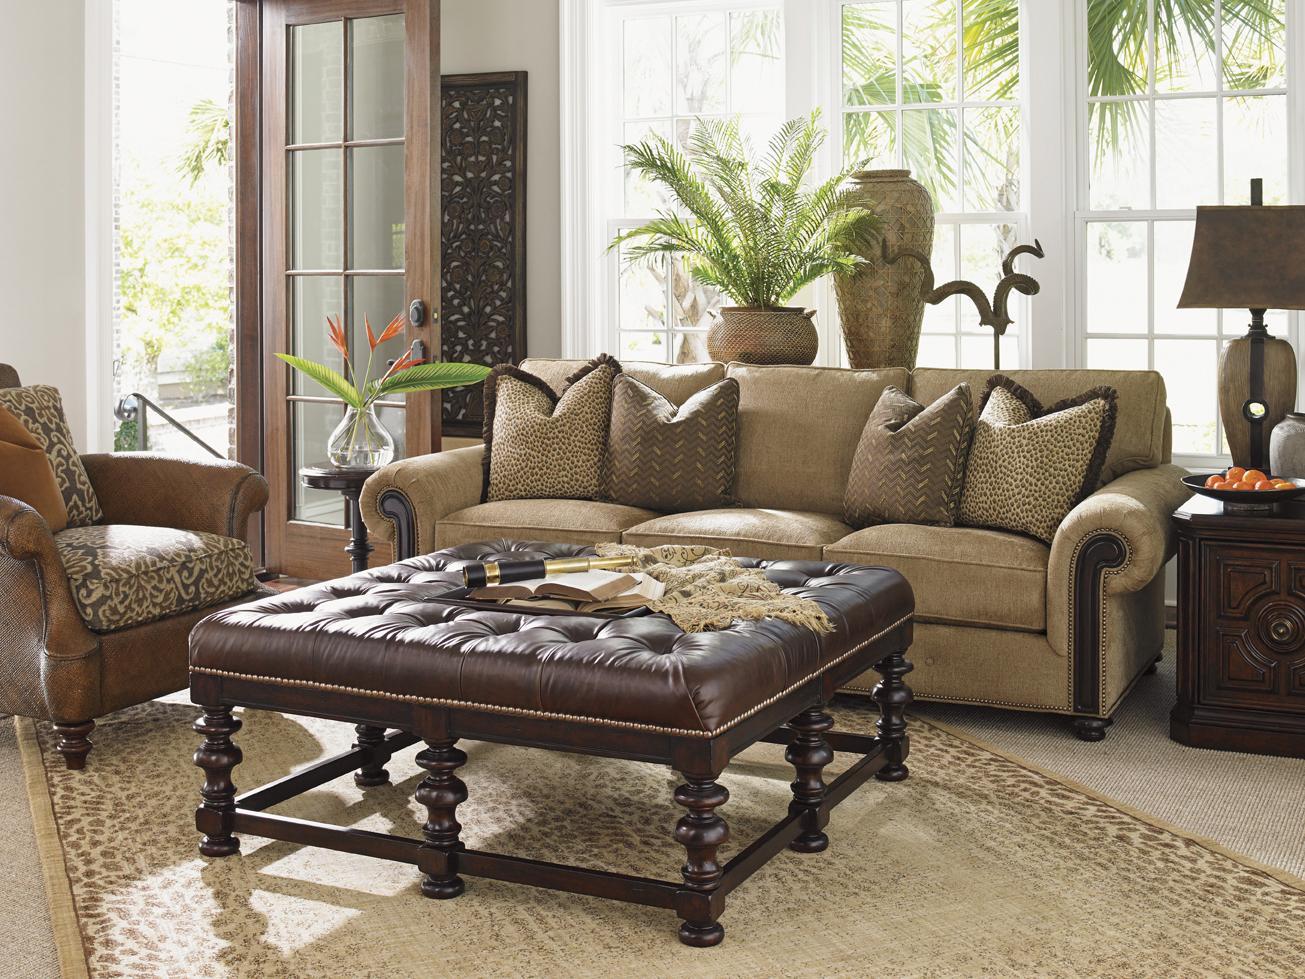 Tommy Bahama Home Kilimanjaro Stationary Living Room Group Belfort Furniture Stationary Living Room Groups